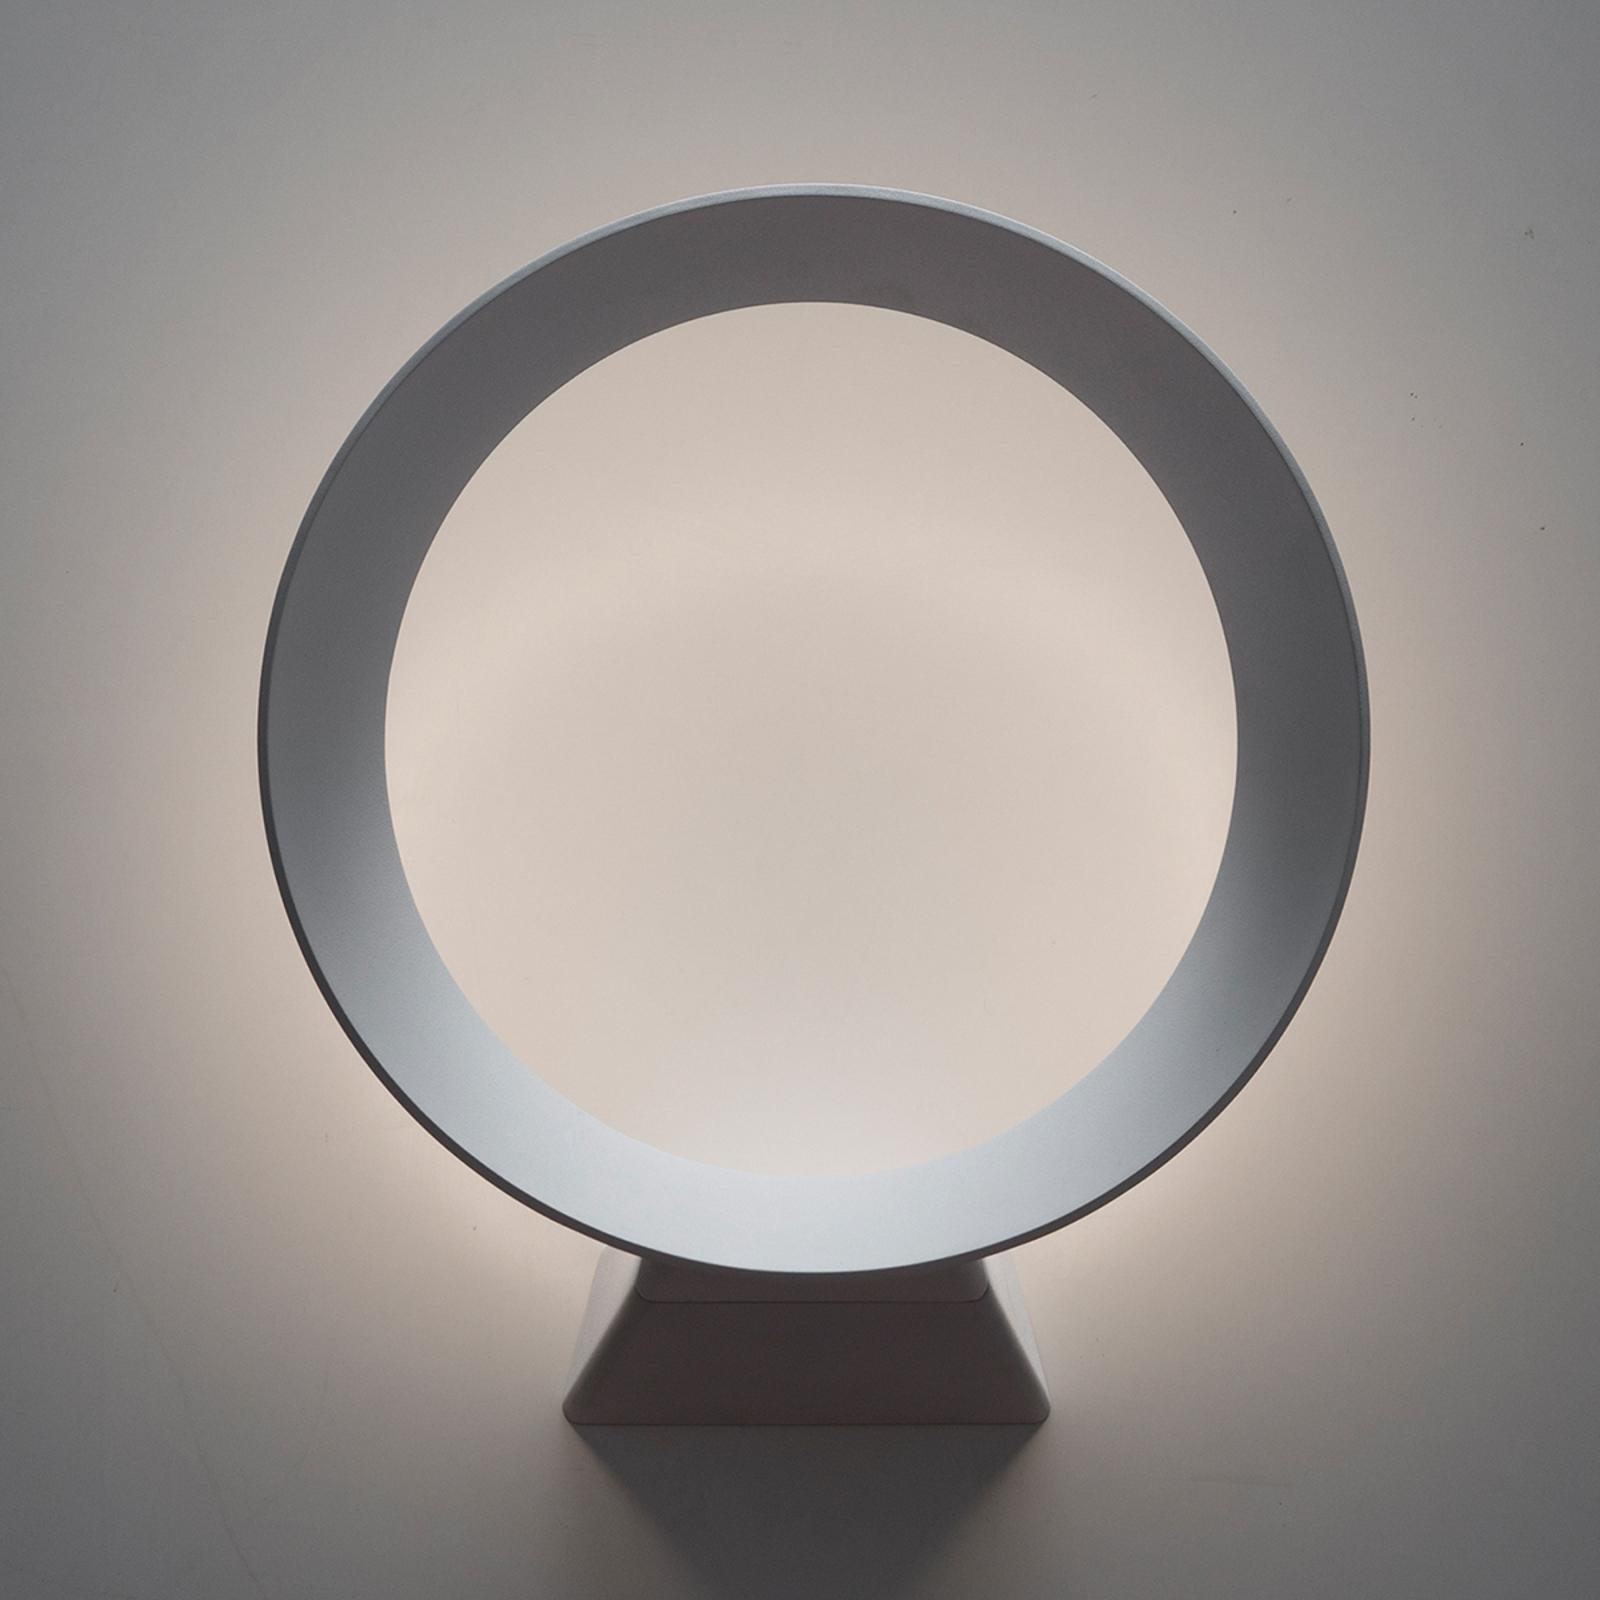 Acquista Martinelli Luce LED+O applique